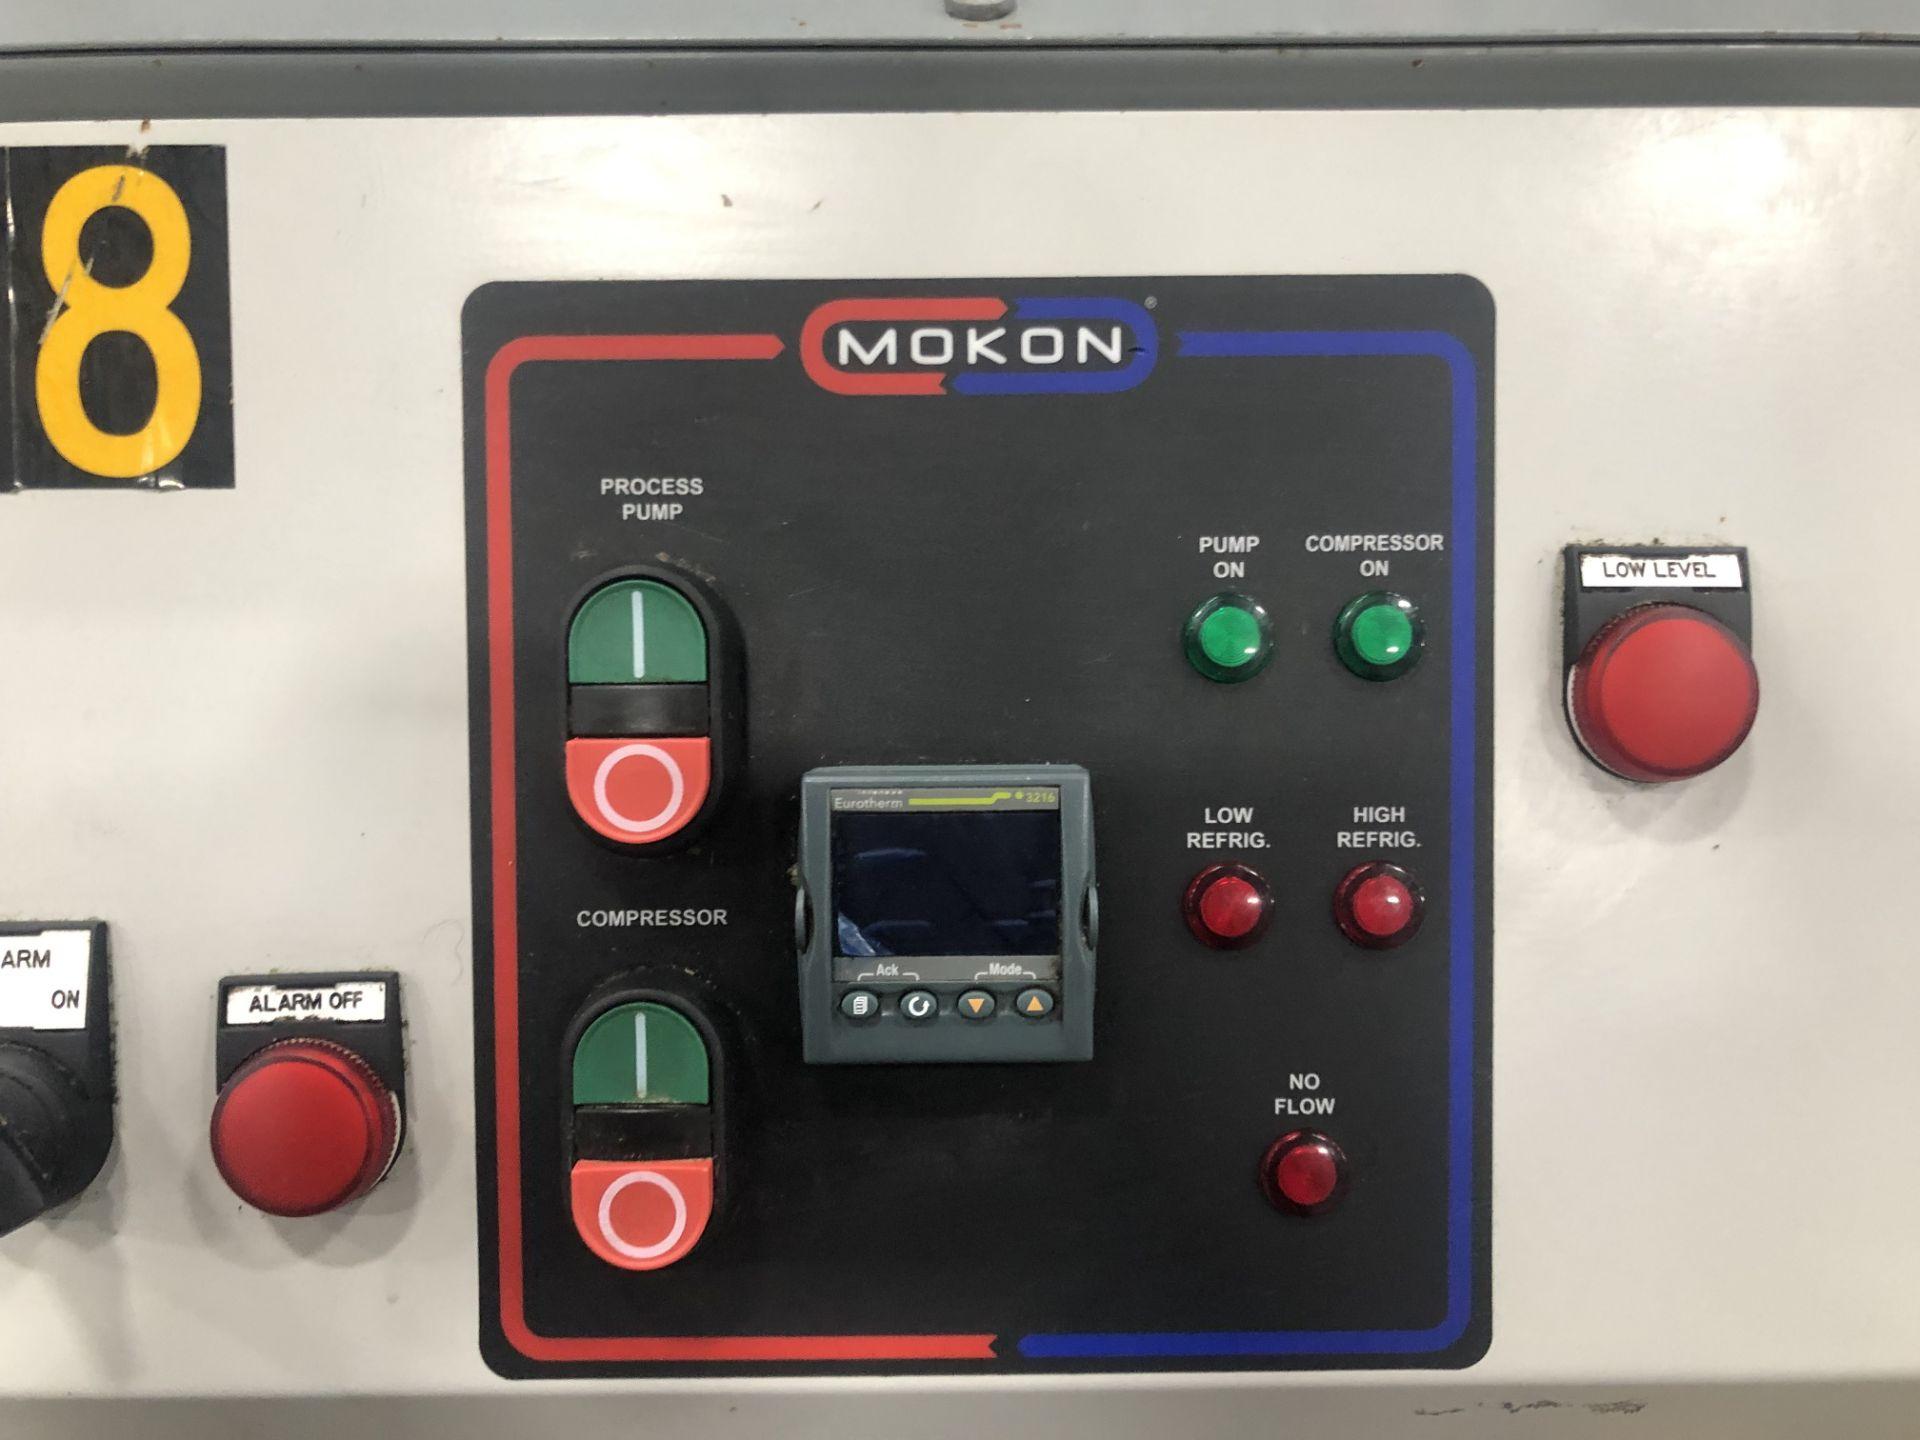 Lot 116B - 10 Ton Mokon Water Cooled Chiller